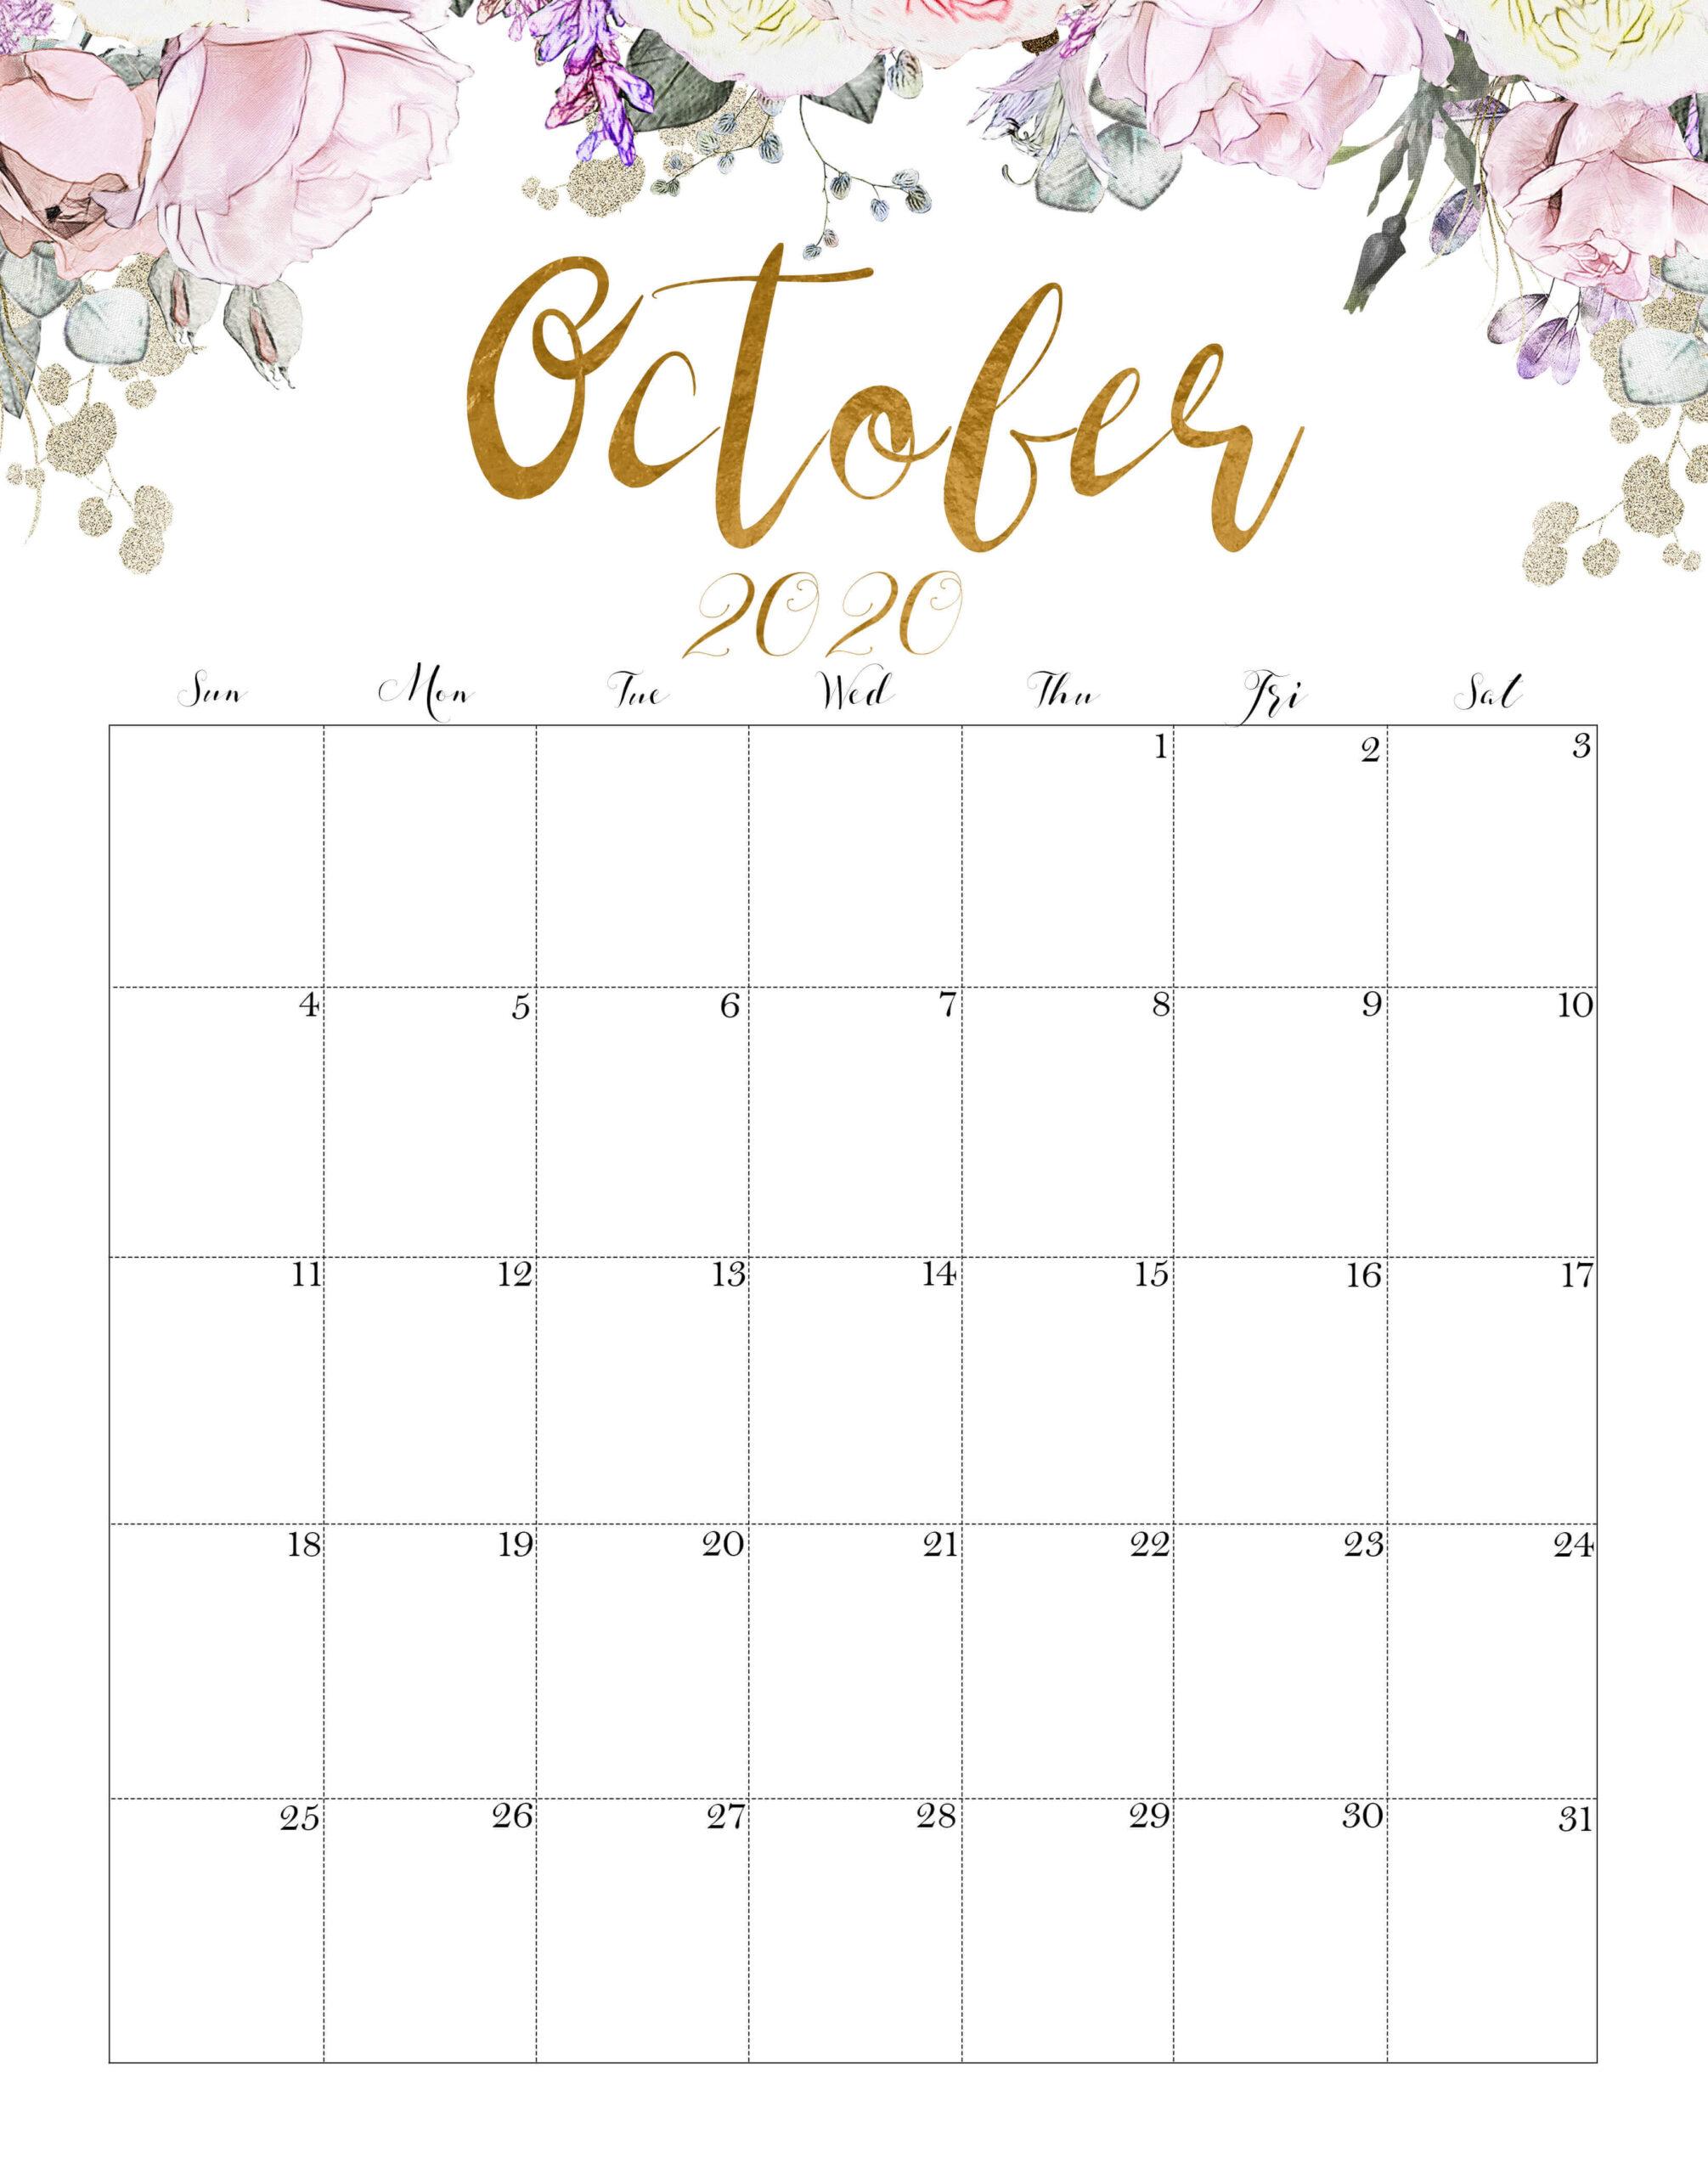 Floral October 2020 Wall Calendar Printable